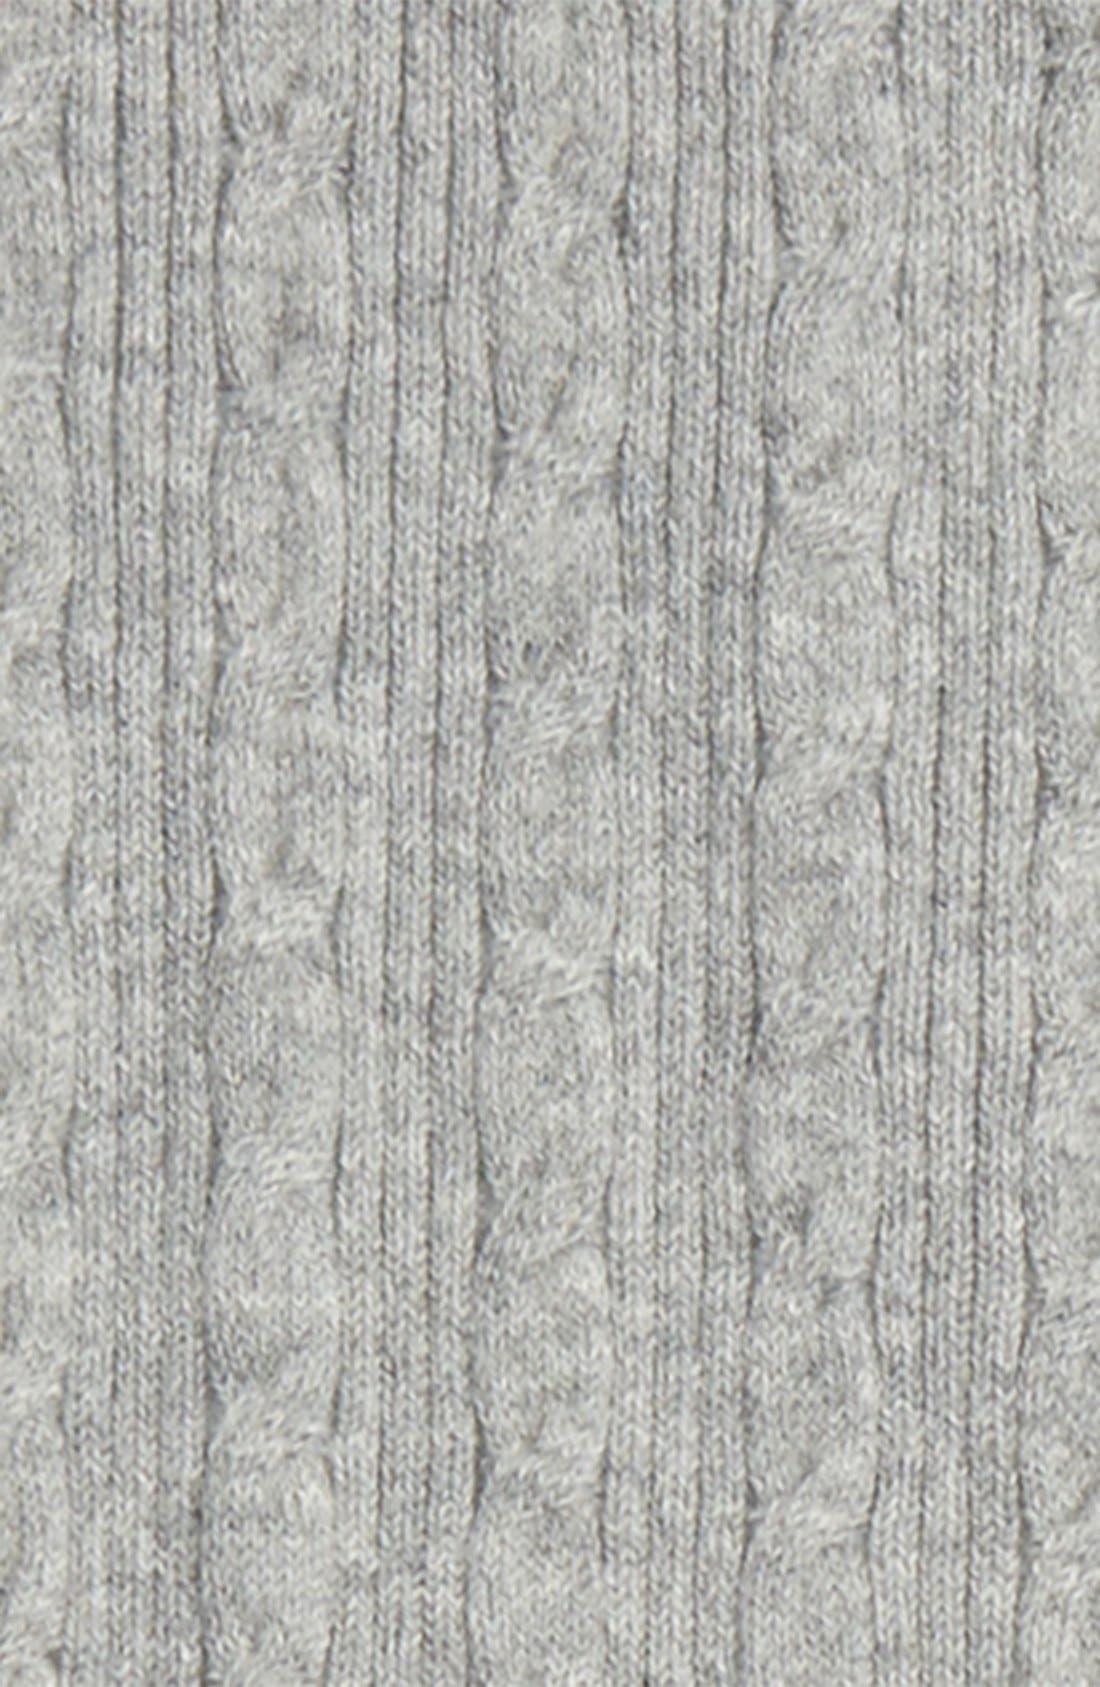 Cable Knit Sweater Leggings,                             Alternate thumbnail 2, color,                             030